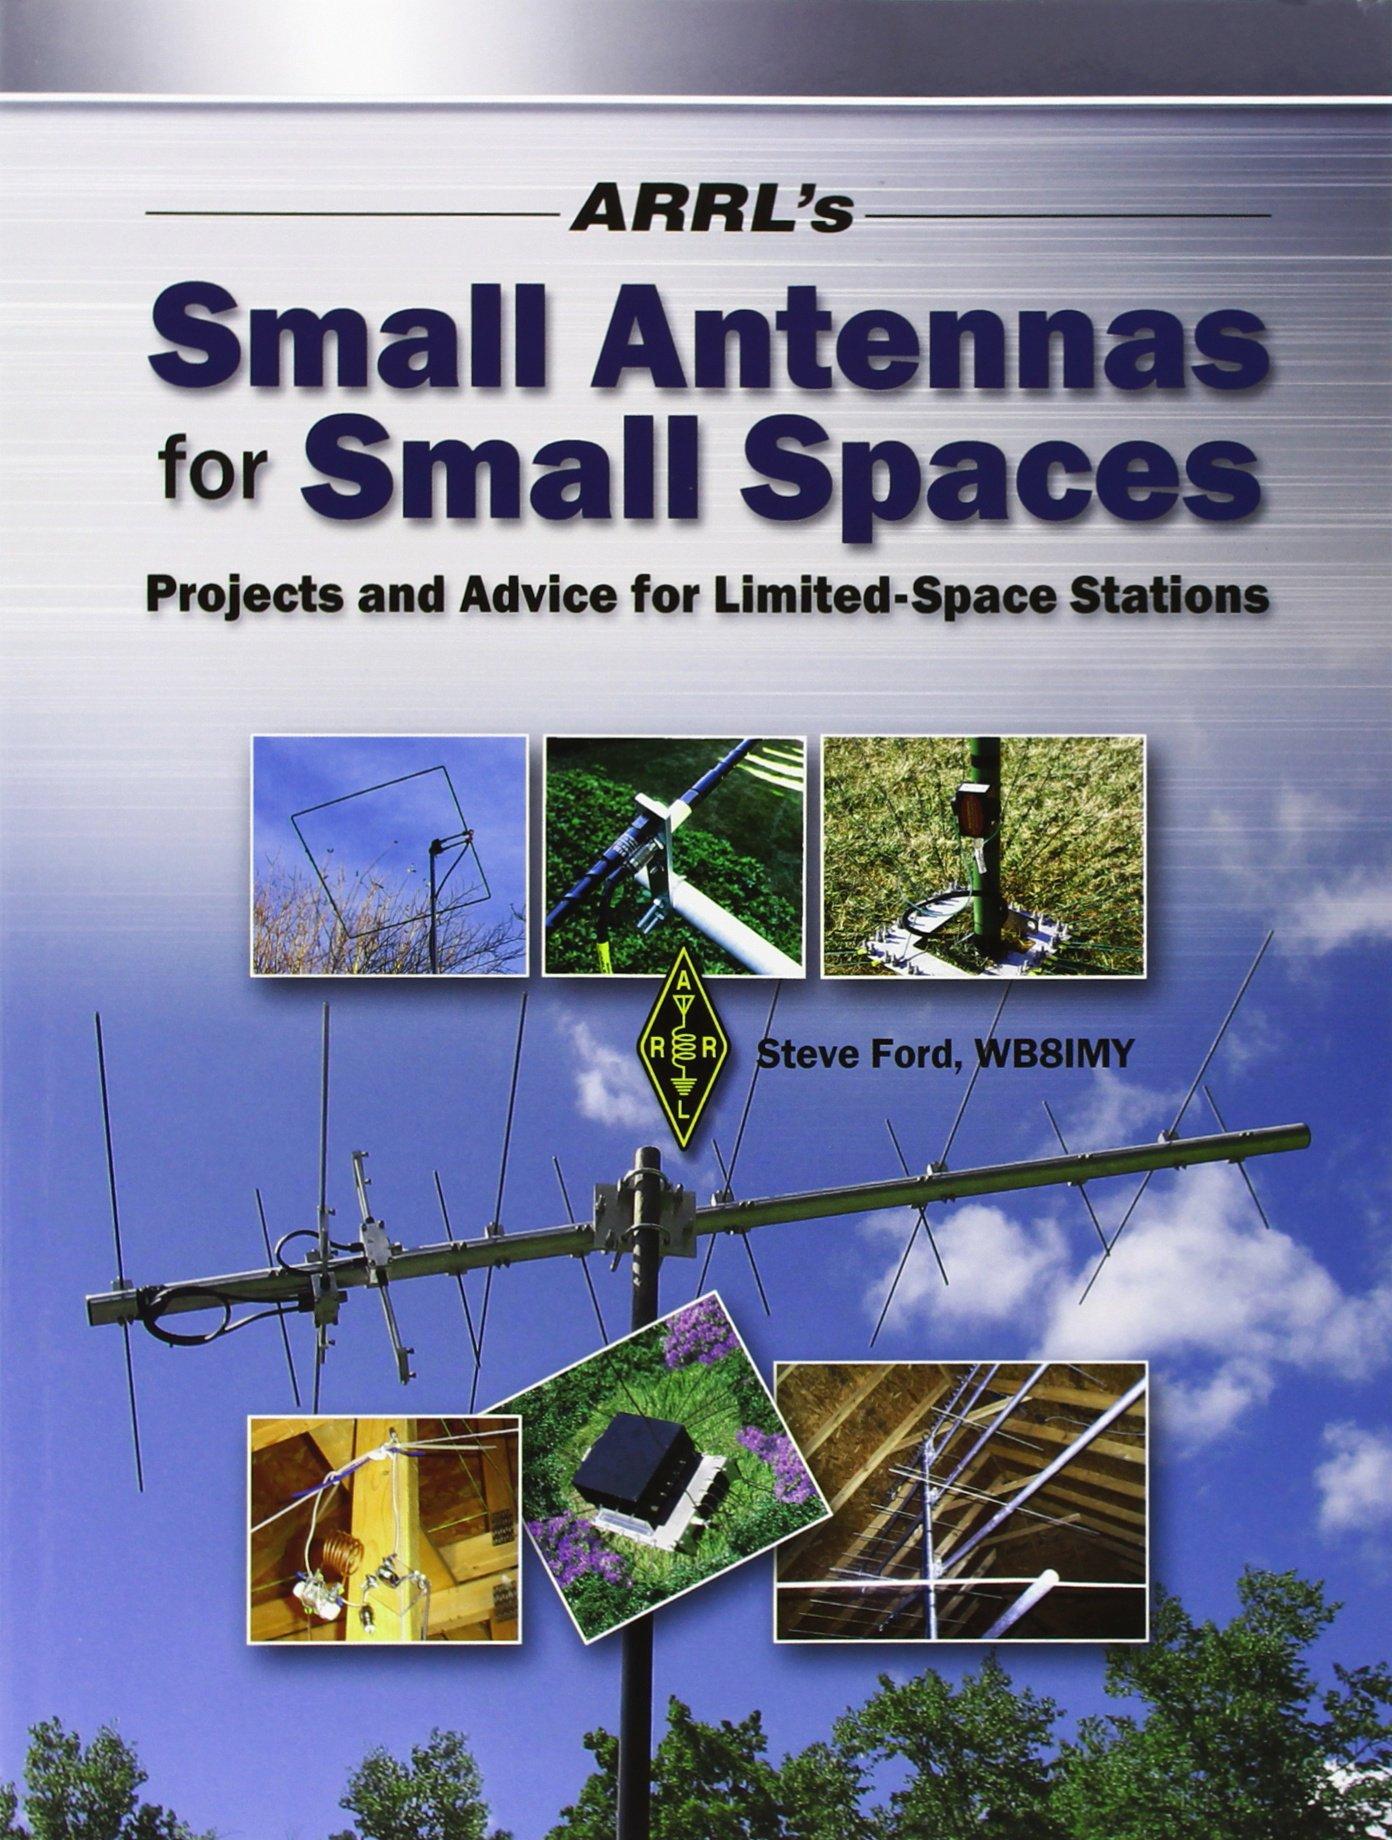 Arrl's Small Antennas for Small Spaces: ARRL Inc , Steve